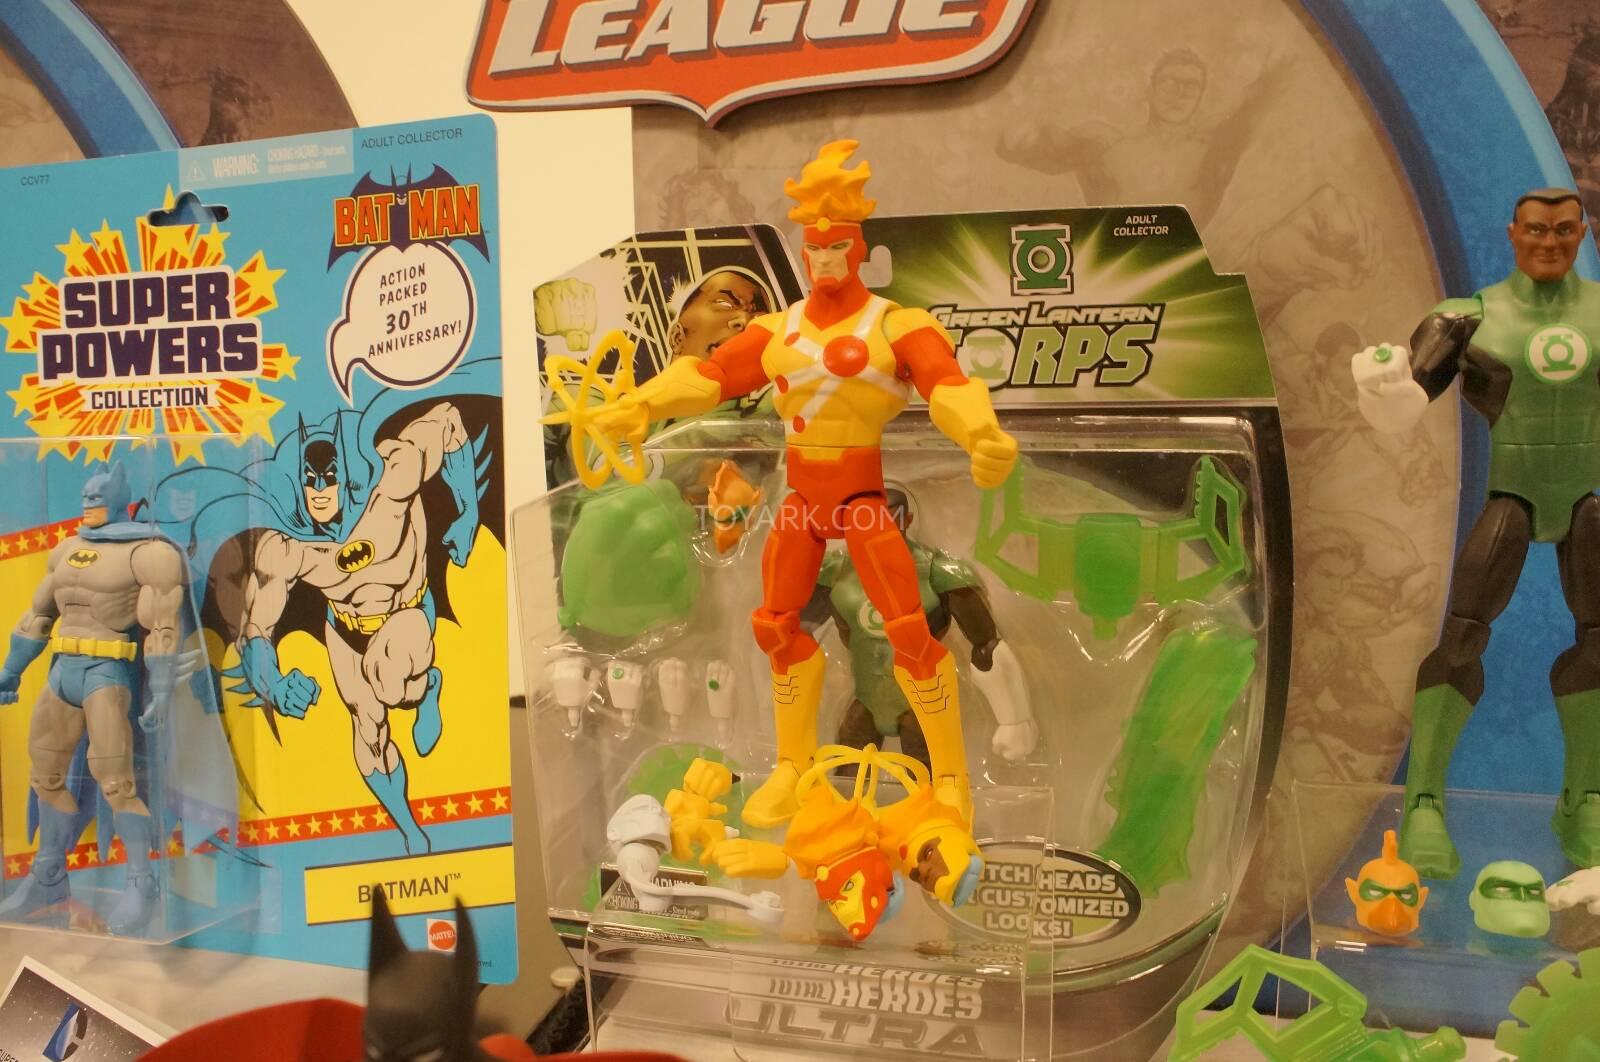 Mattel's Total Heroes Firestorm action figure at Toy Fair 2014